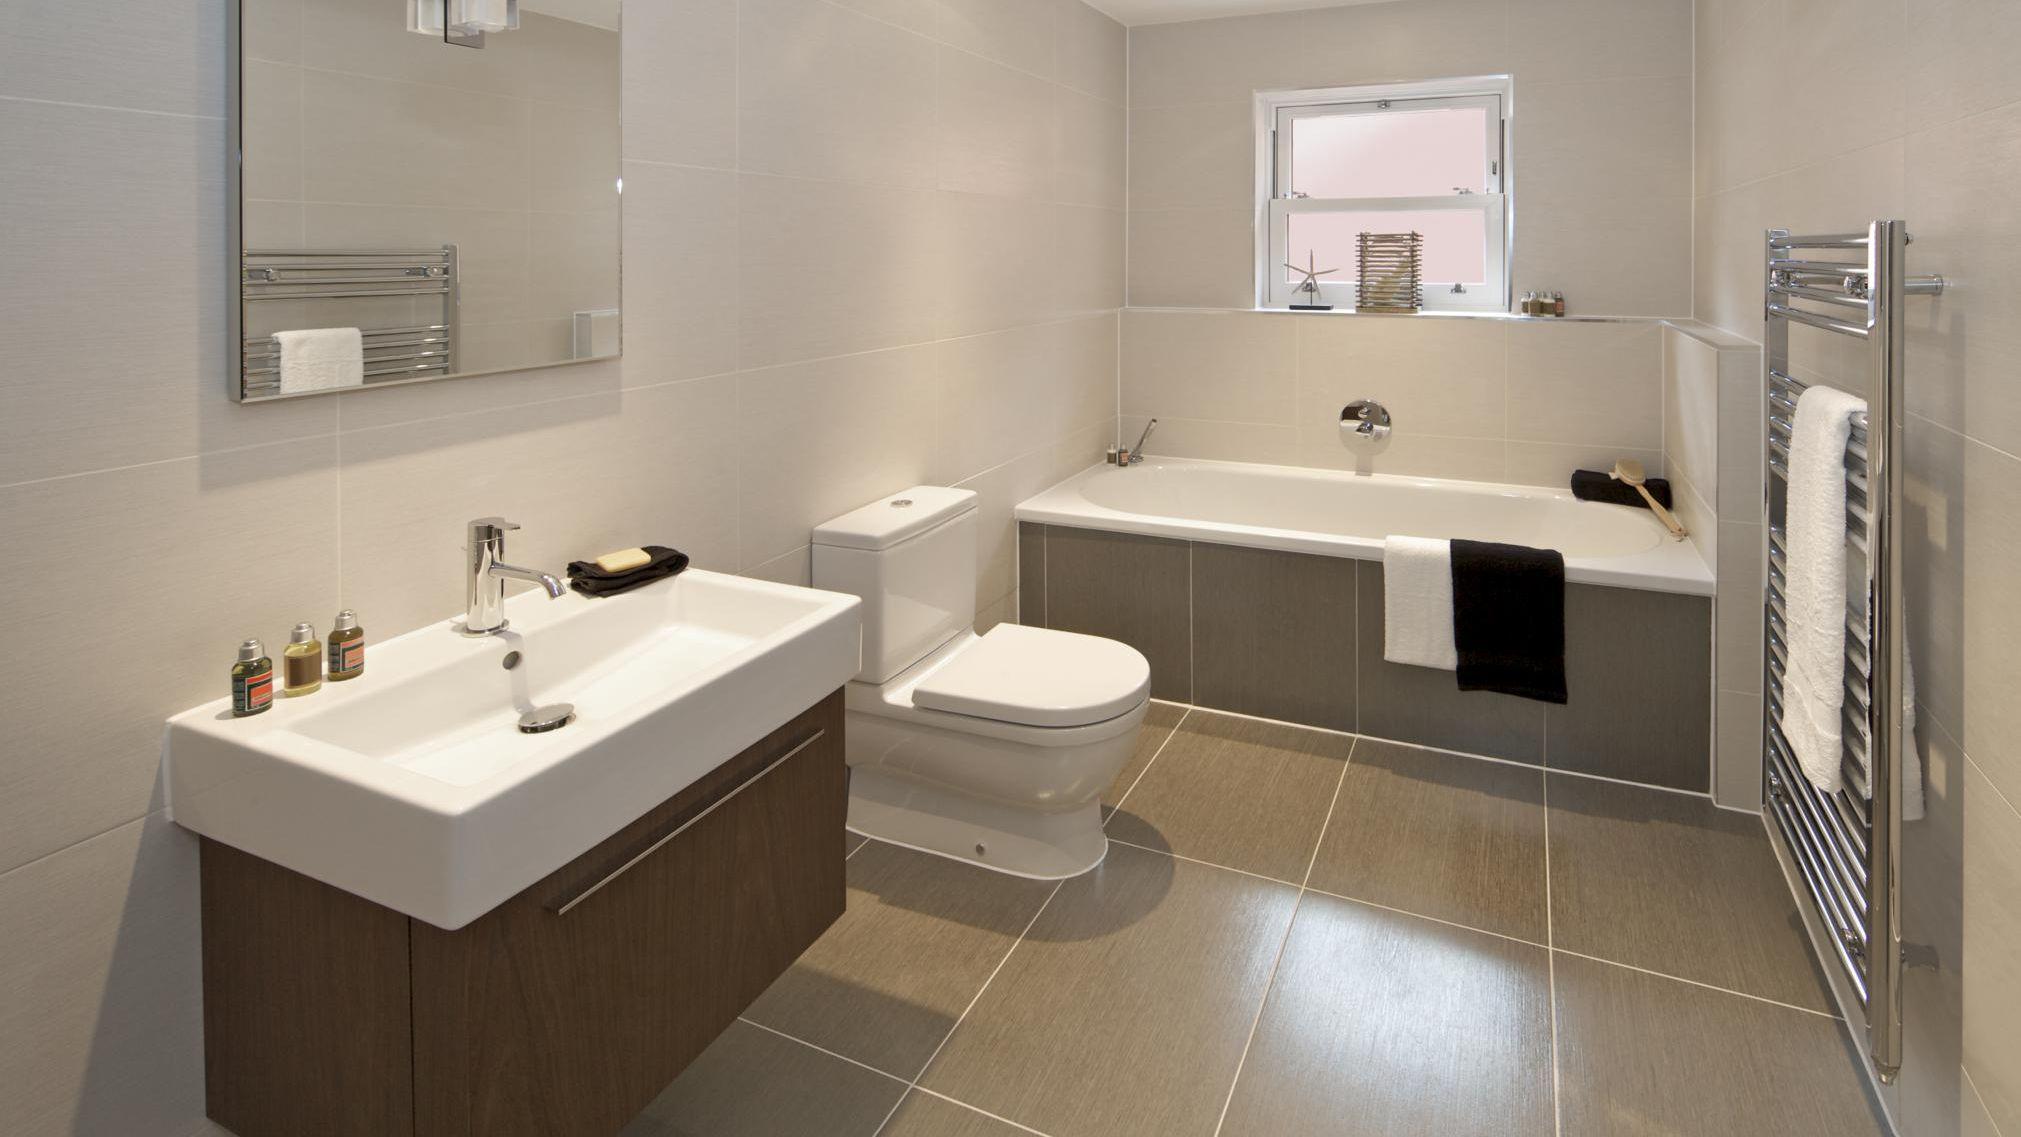 Bathroom Tile Size Advice Floors Showers And Tubs